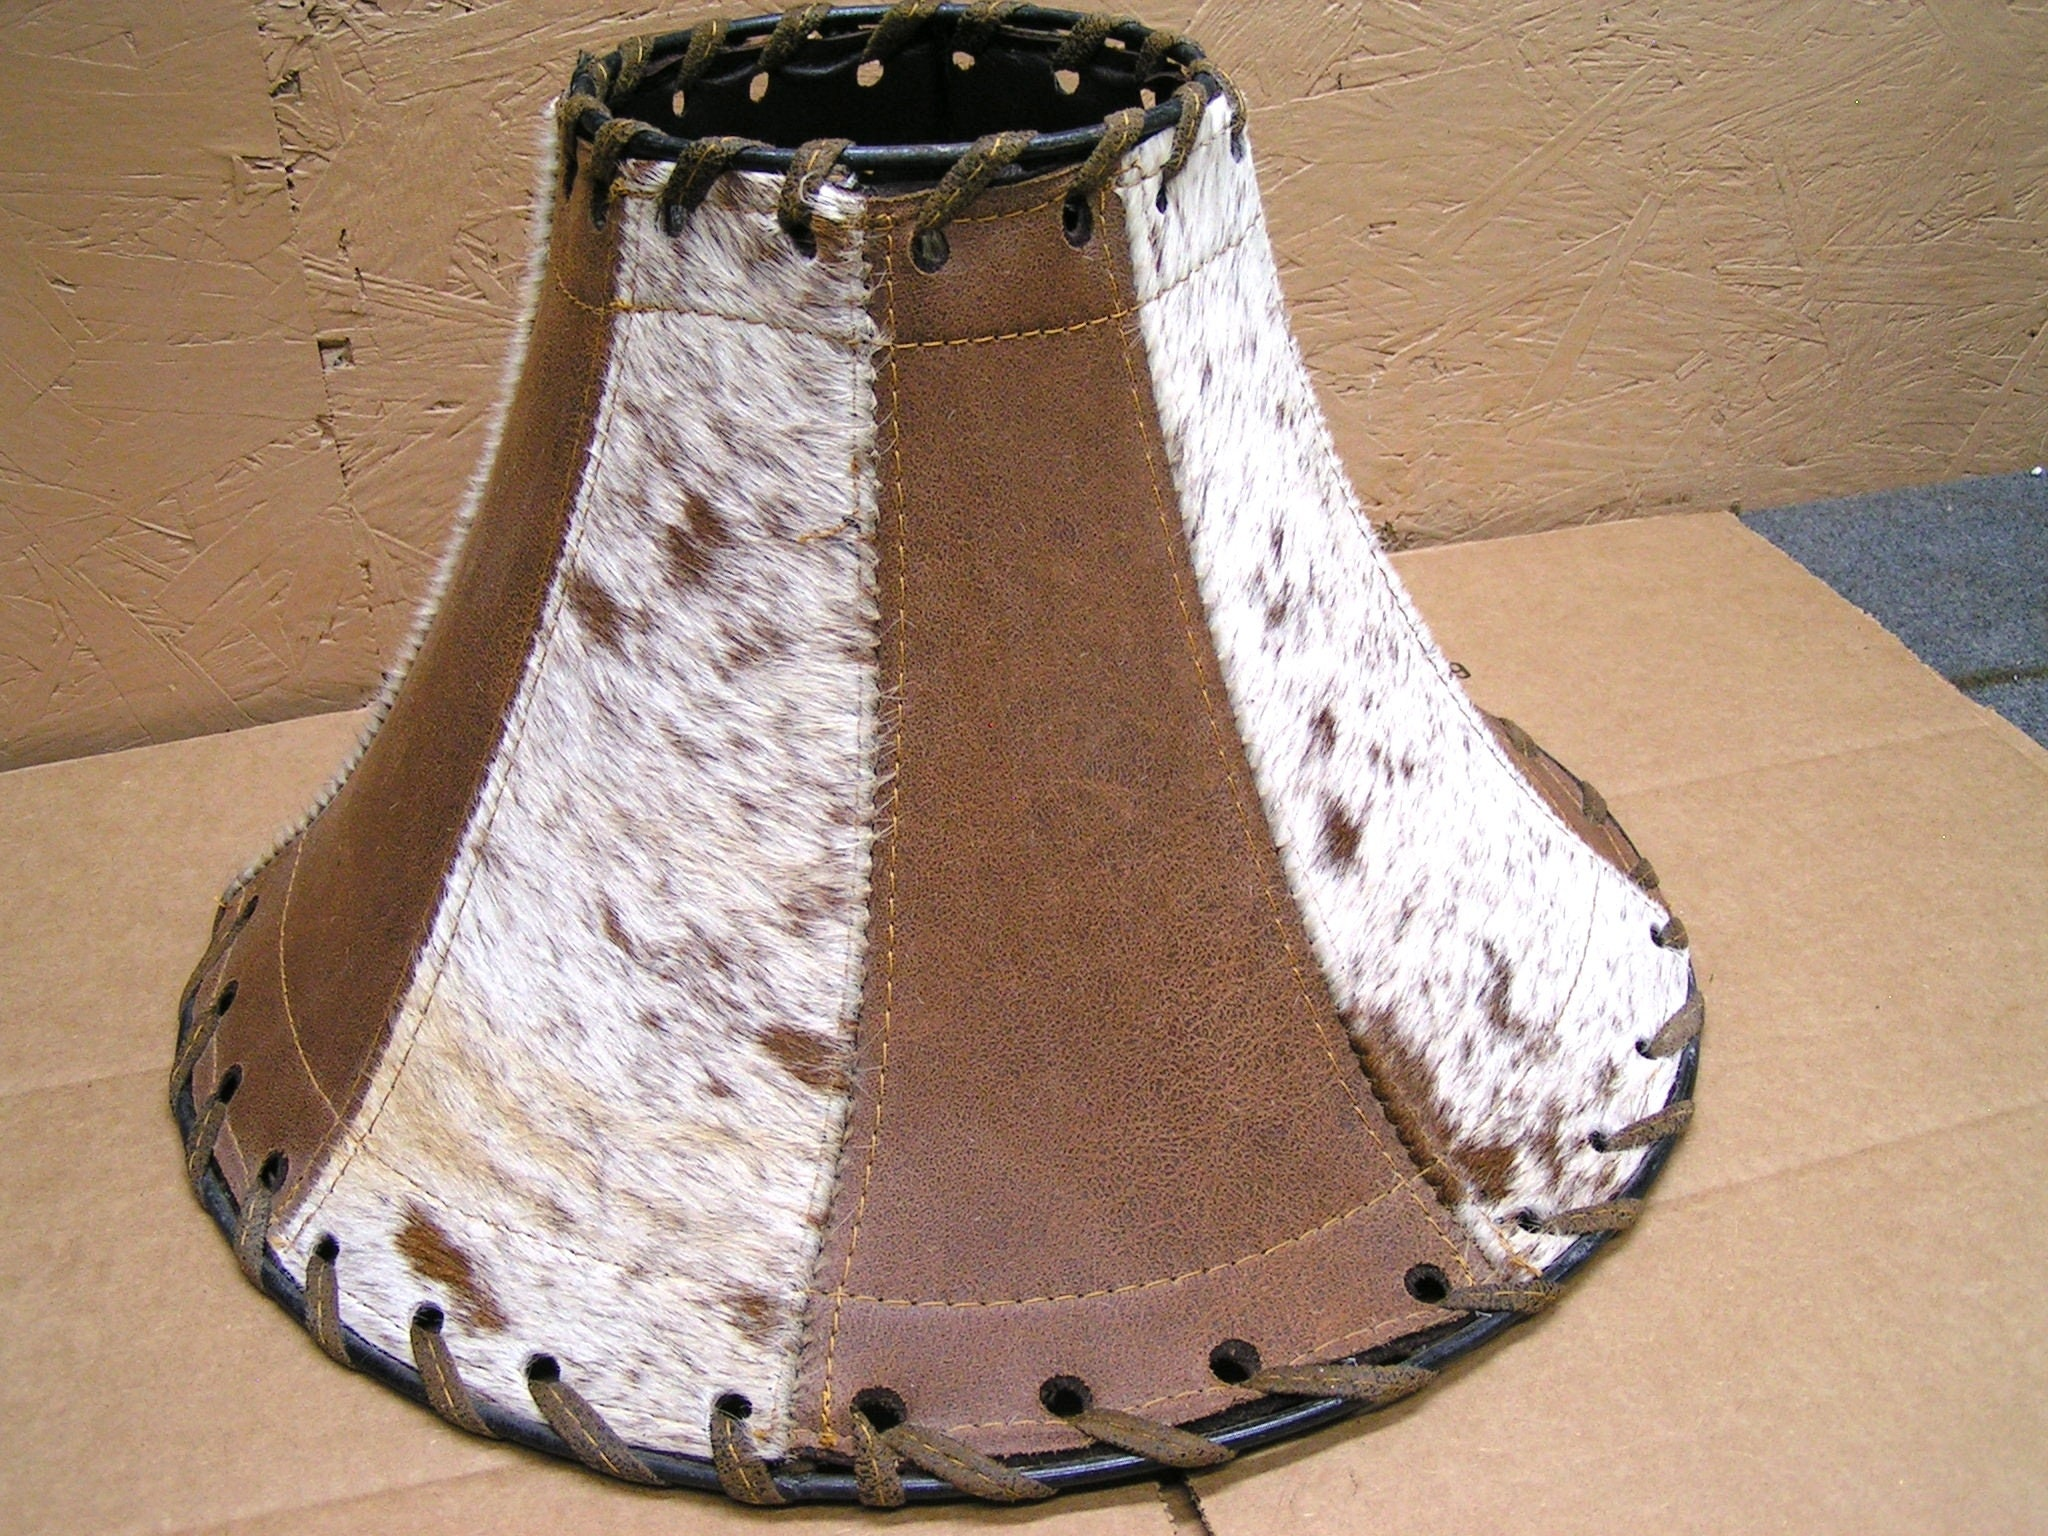 Southwest Leather Western Cowhide Lamp Shade, rustic lighting 0752